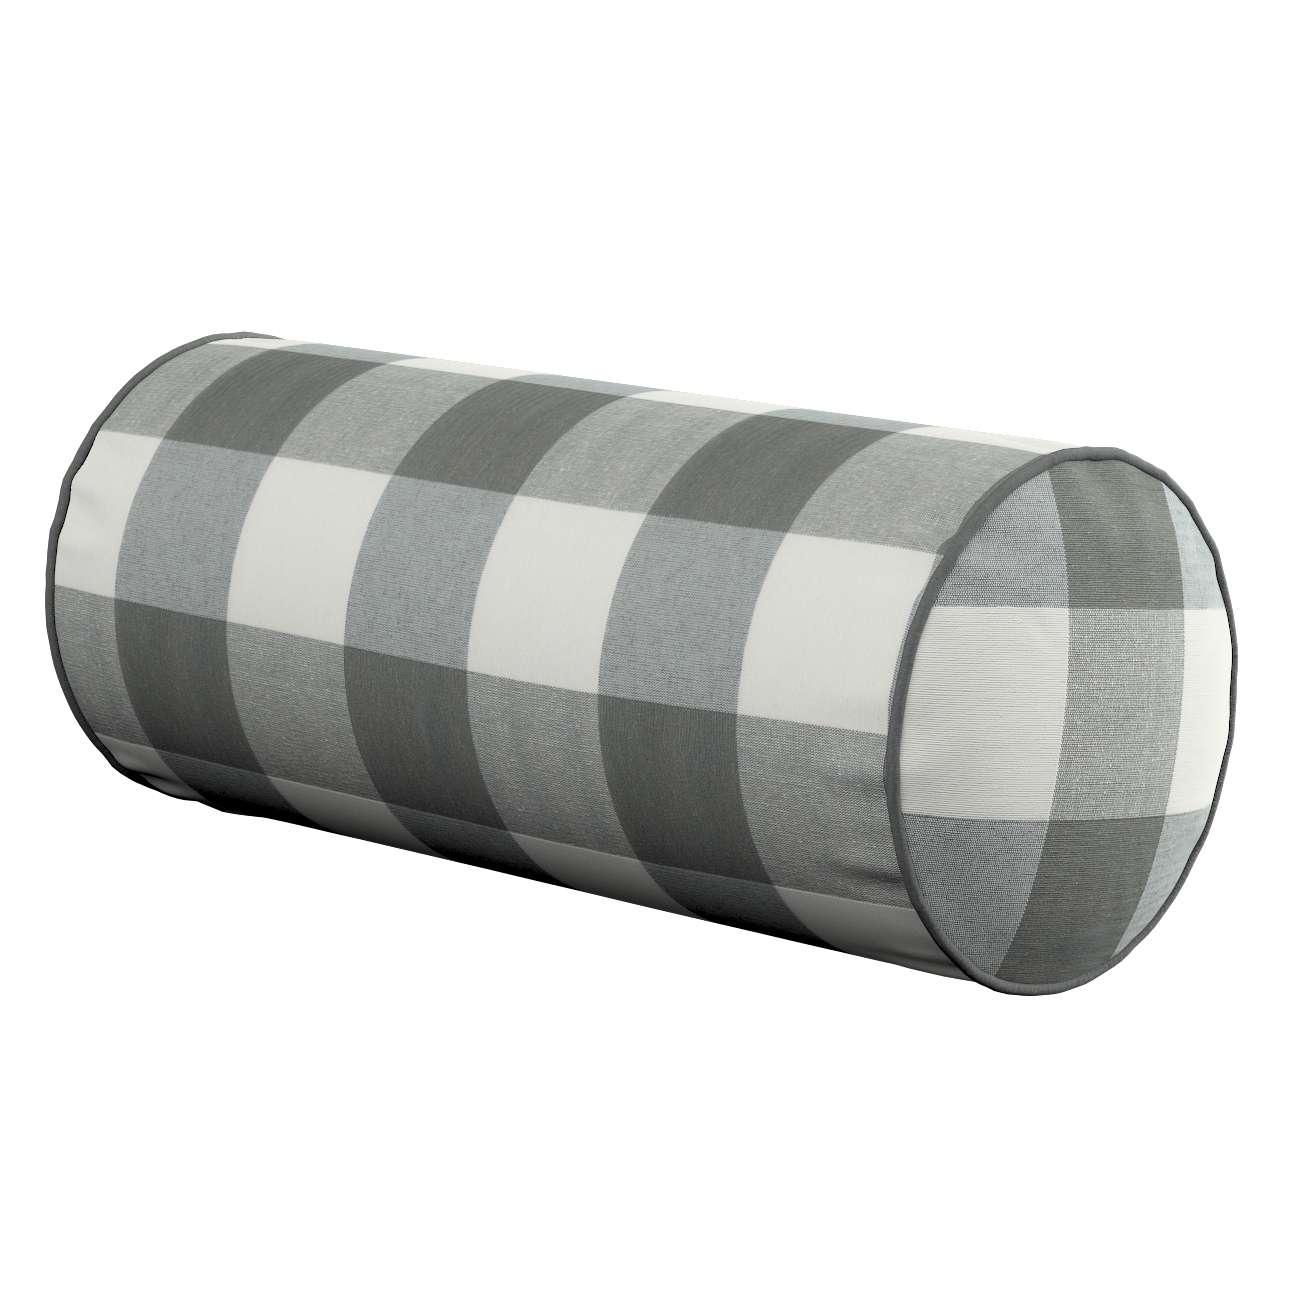 Valček jednoduchý V kolekcii Quadro, tkanina: 136-13